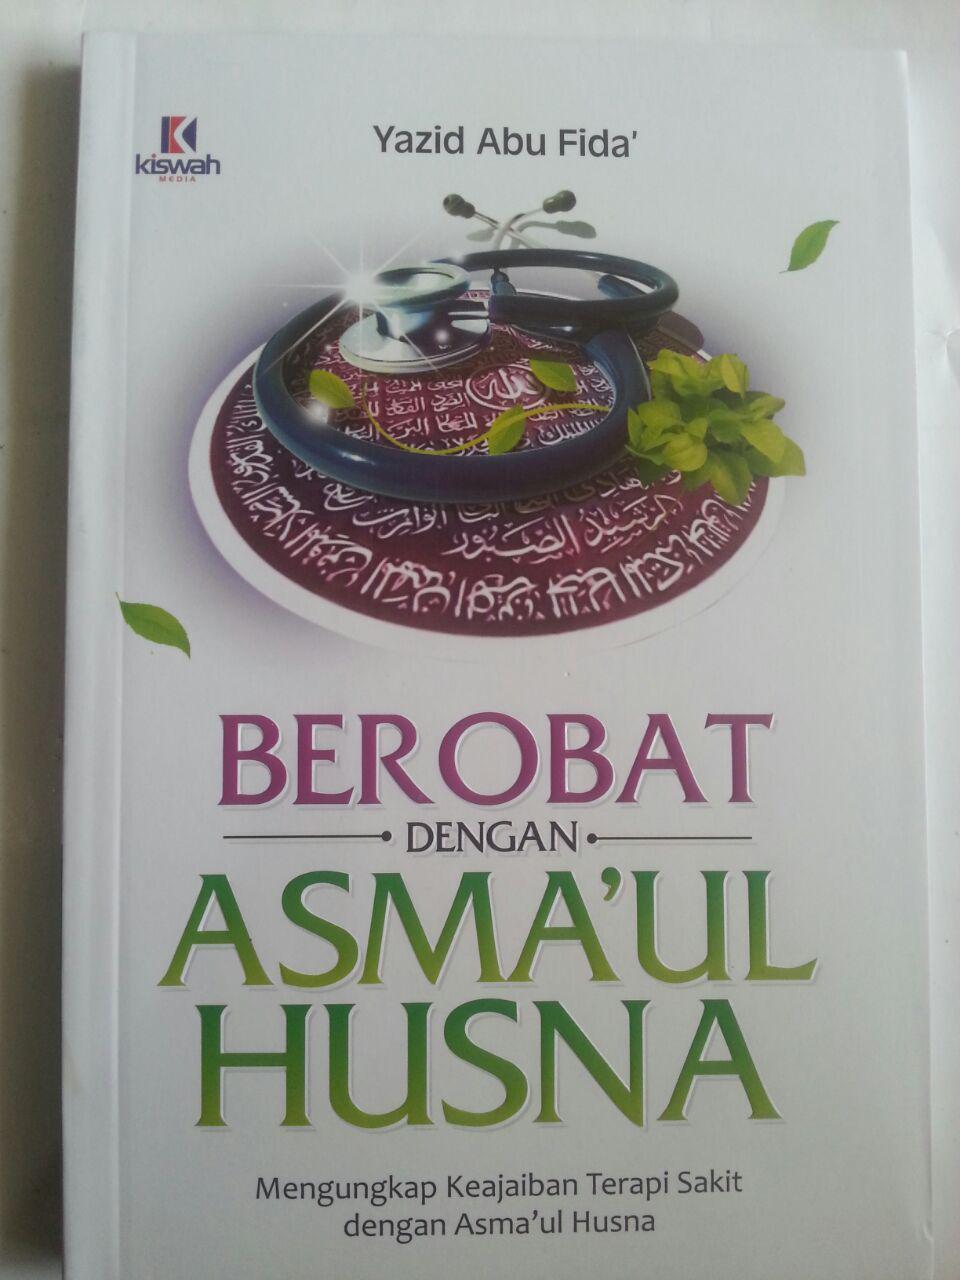 Buku Berobat Dengan Asmaul Husna Keajaiban Terapi cover 2